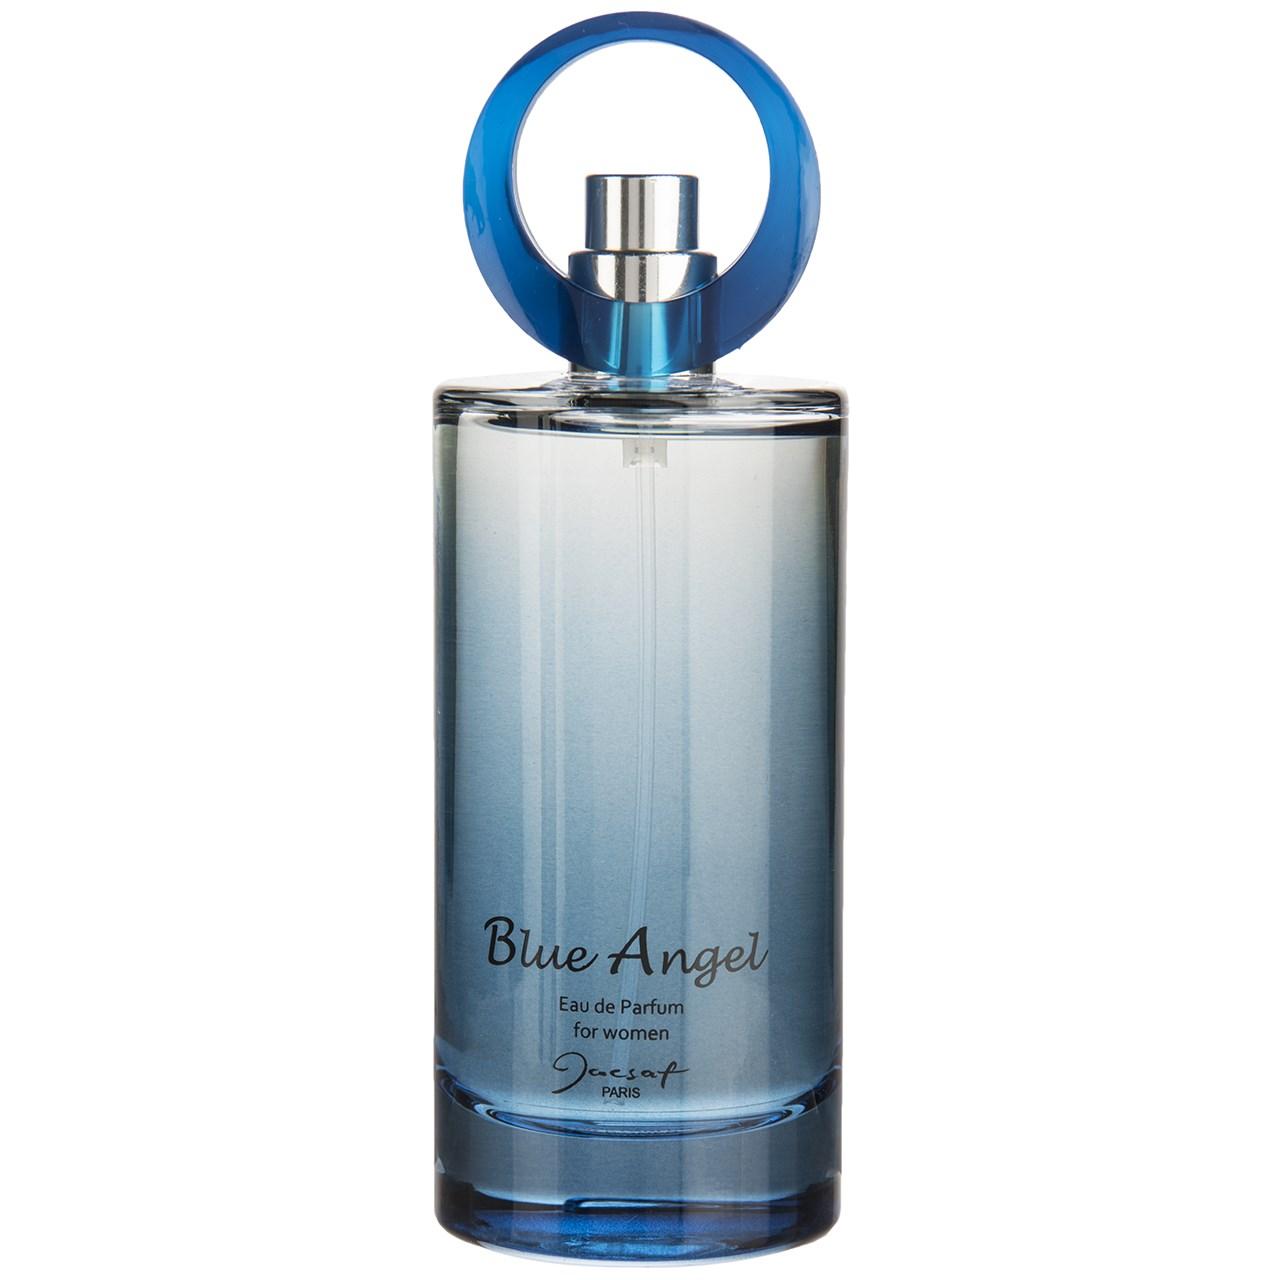 ادو پرفیوم زنانه ژک ساف مدل Blue Angel حجم 100 میلی لیتر